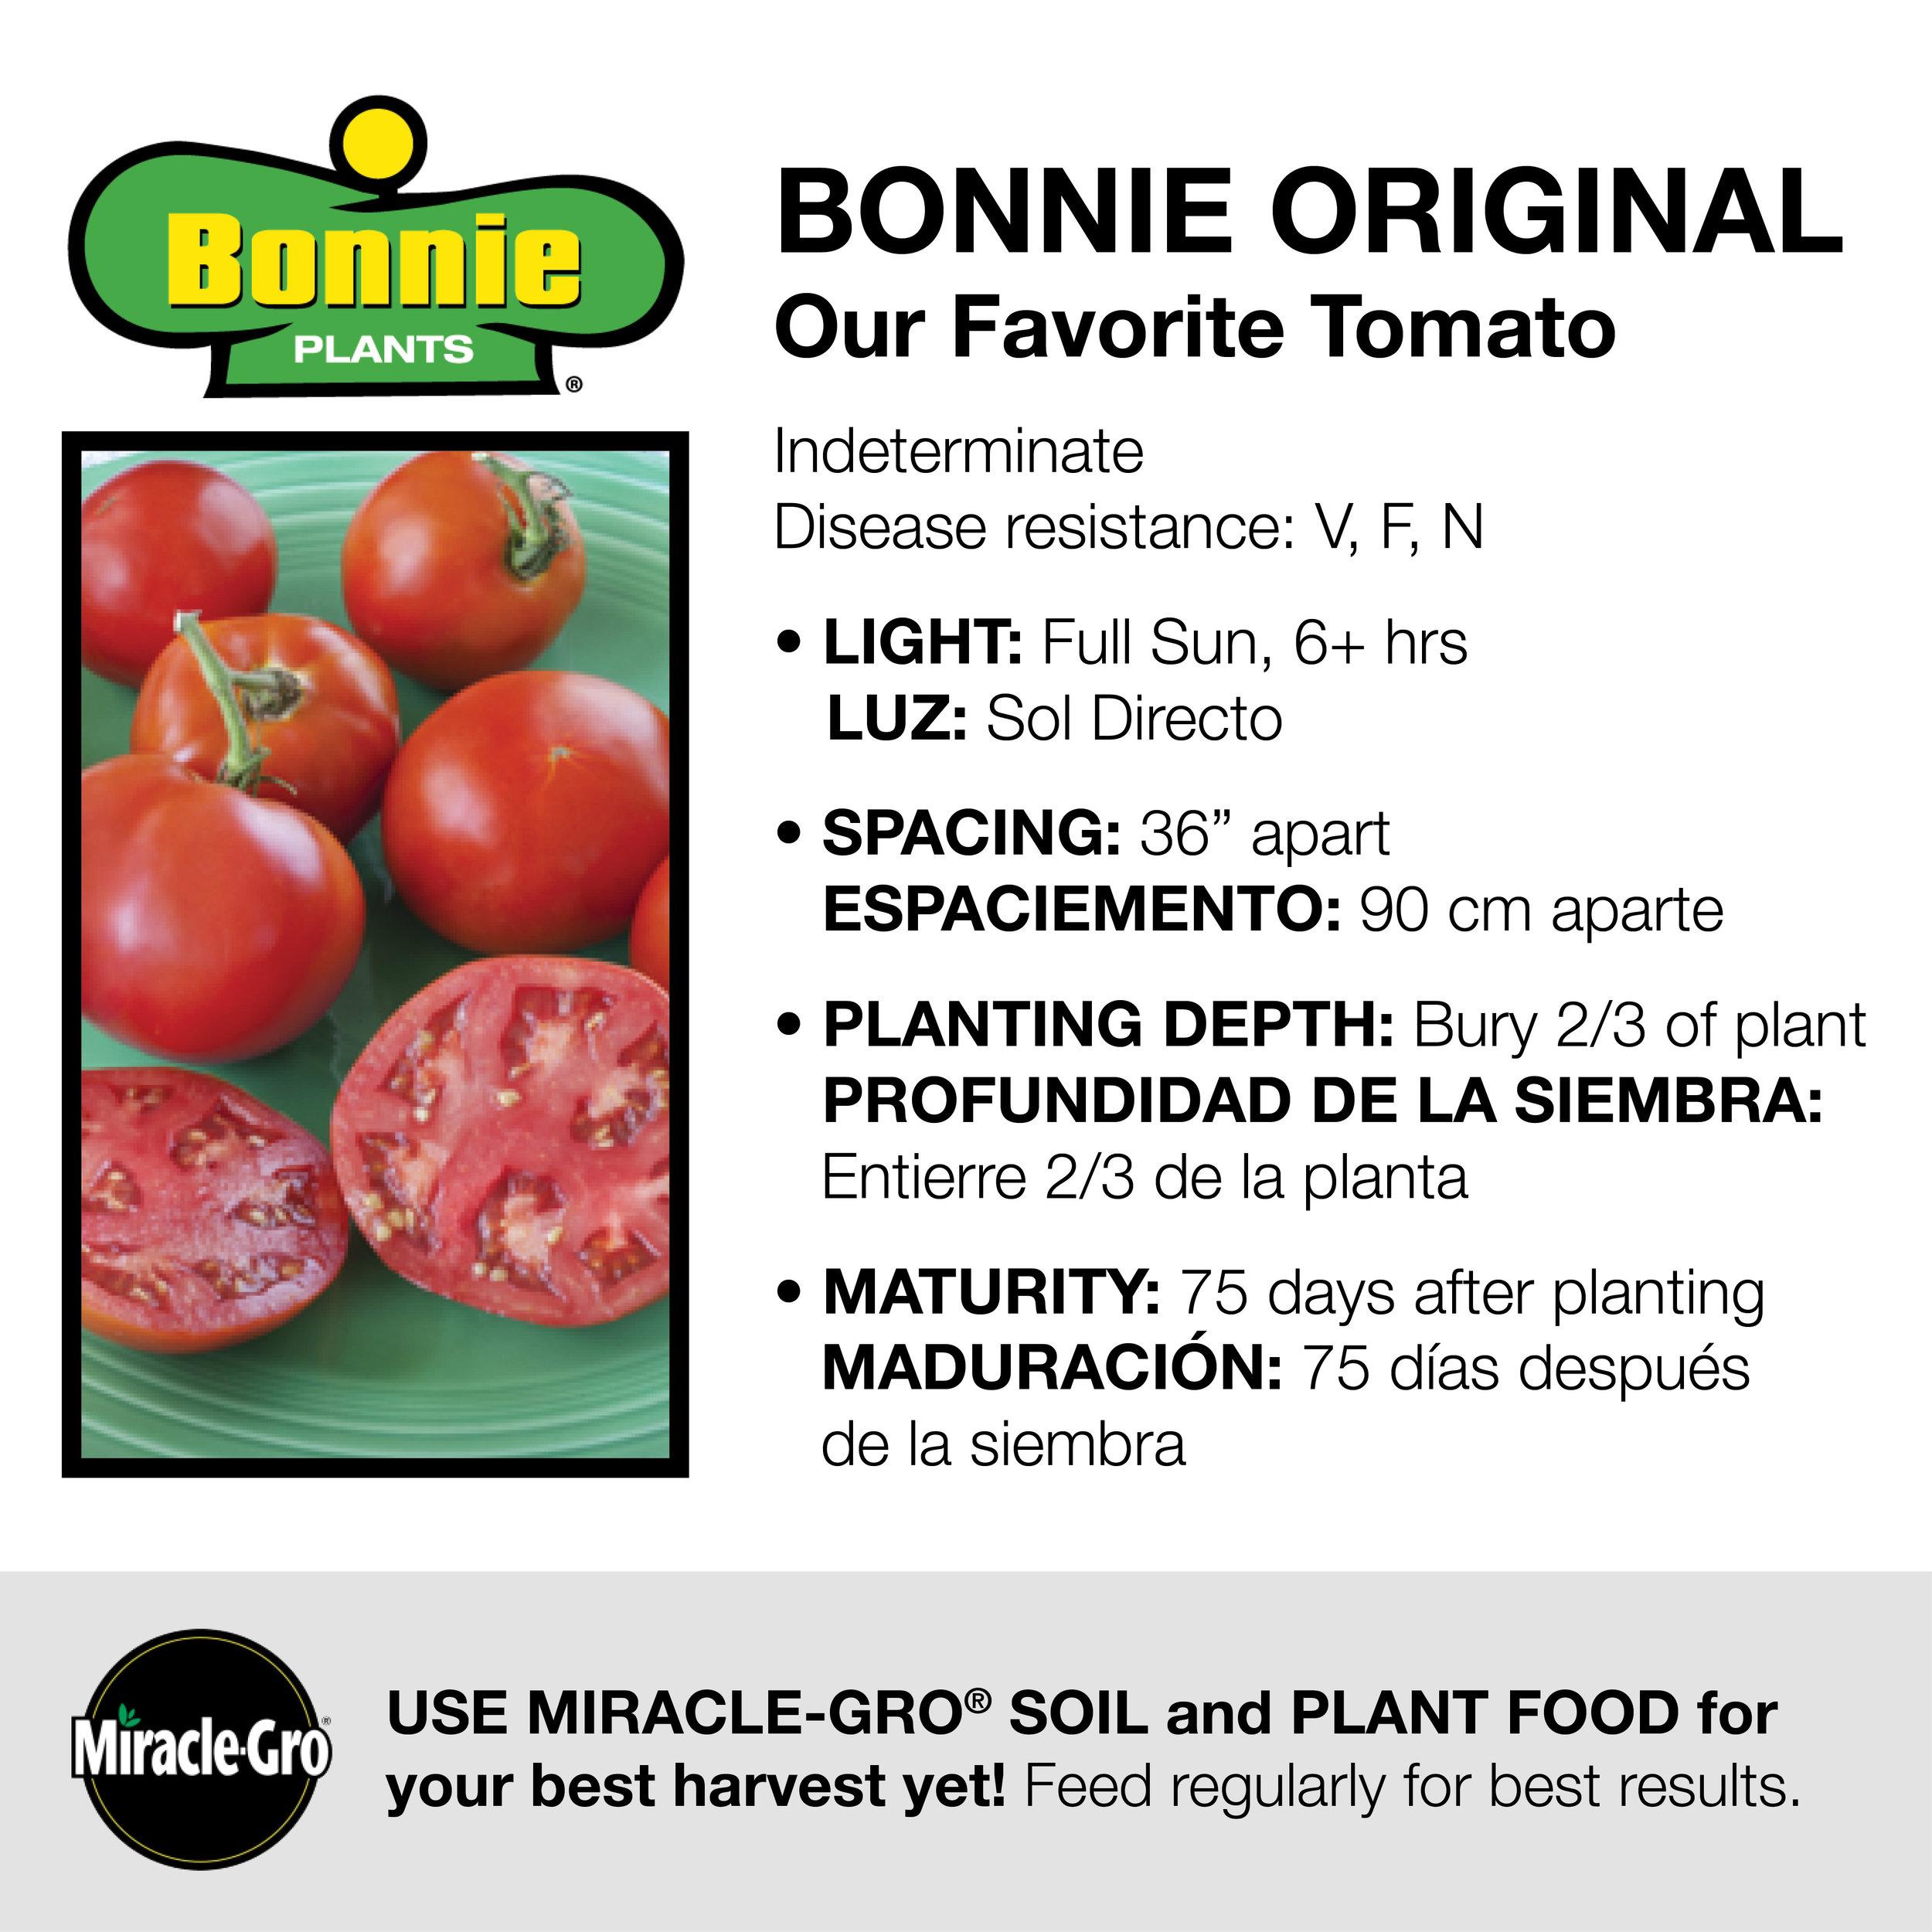 Image via Bonnie Plants and Walmart.com